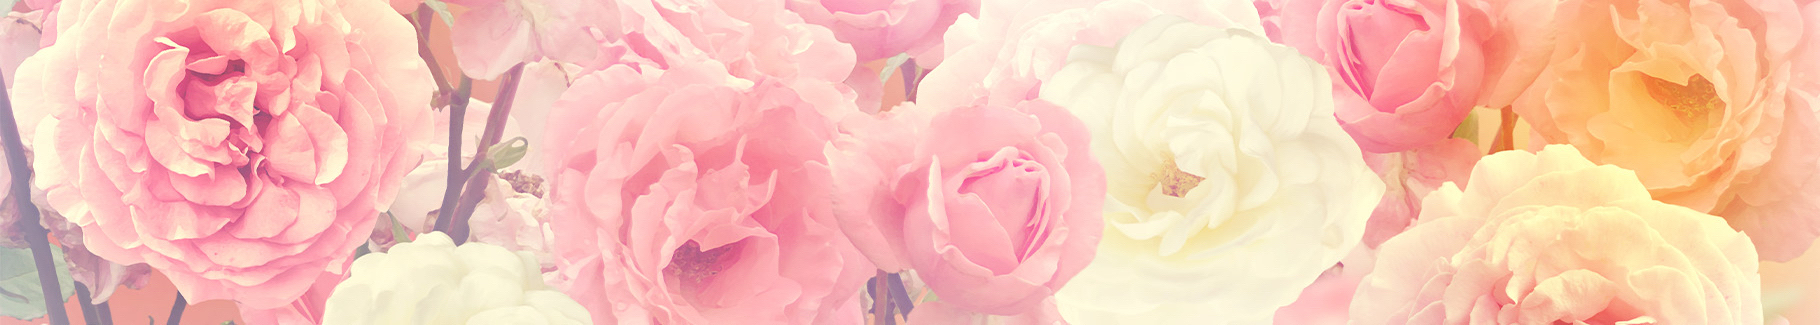 Kolorowa fototapeta róże